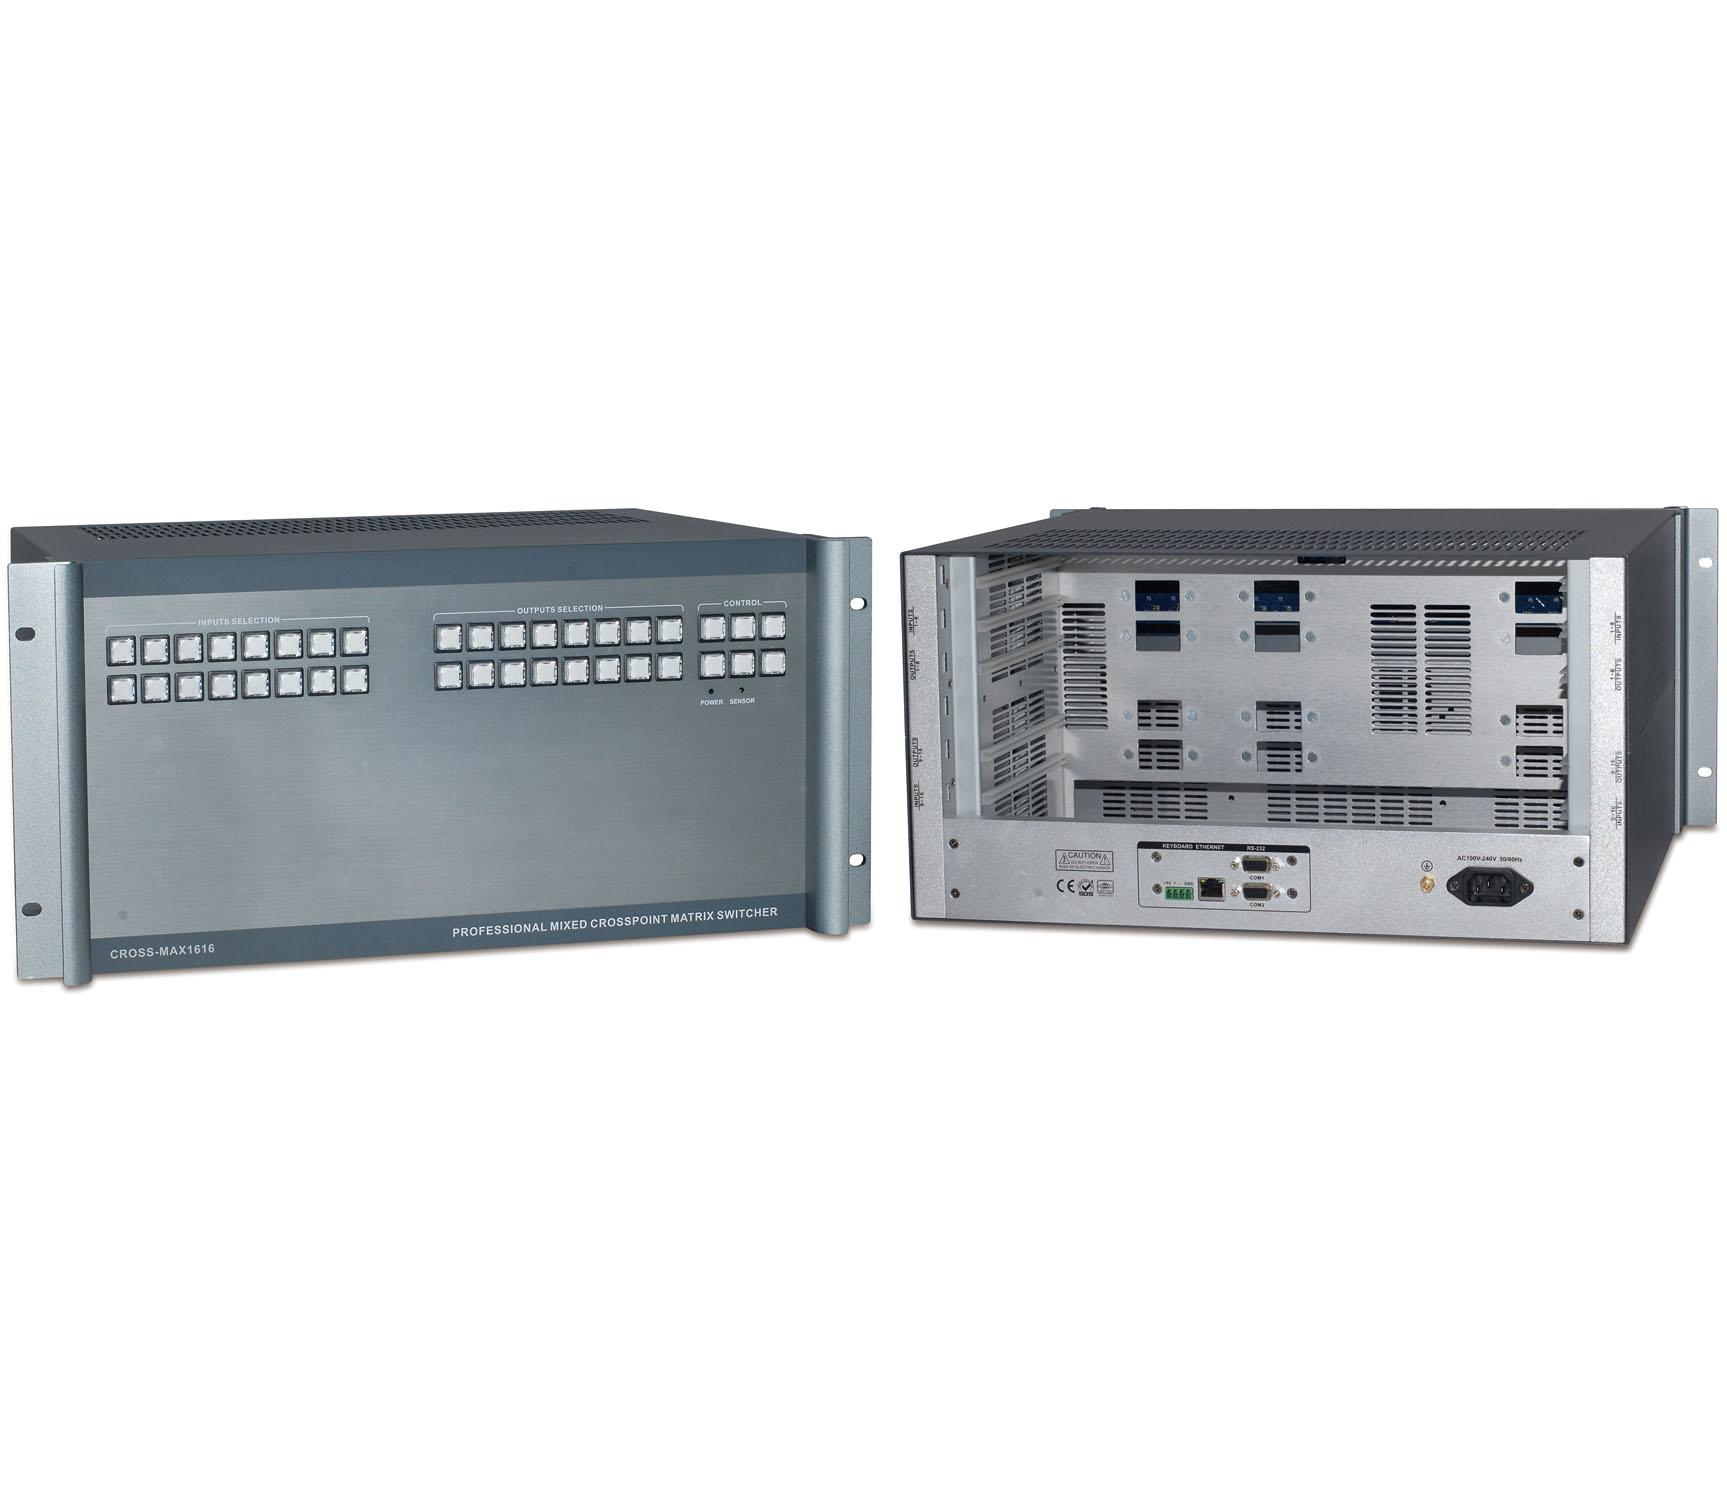 CROSS系列混合矩阵切换器-CROSS-MAX1616图片